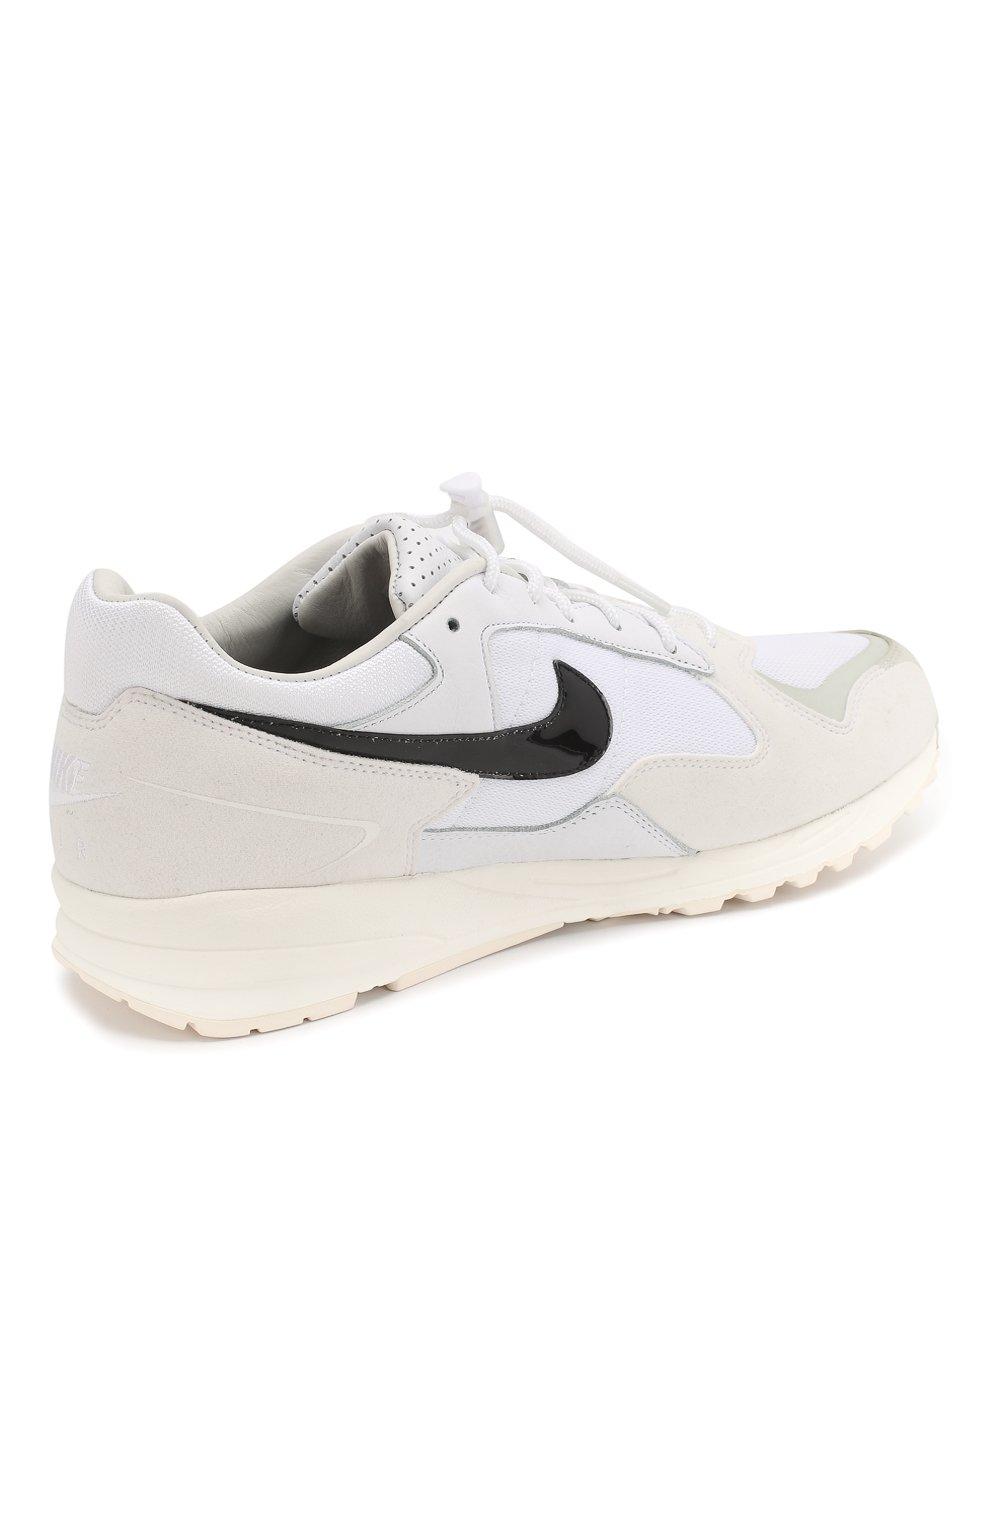 2f790085 Комбинированные кроссовки Nike x Fear of God Air Skylon II NikeLab белые |  Фото №4